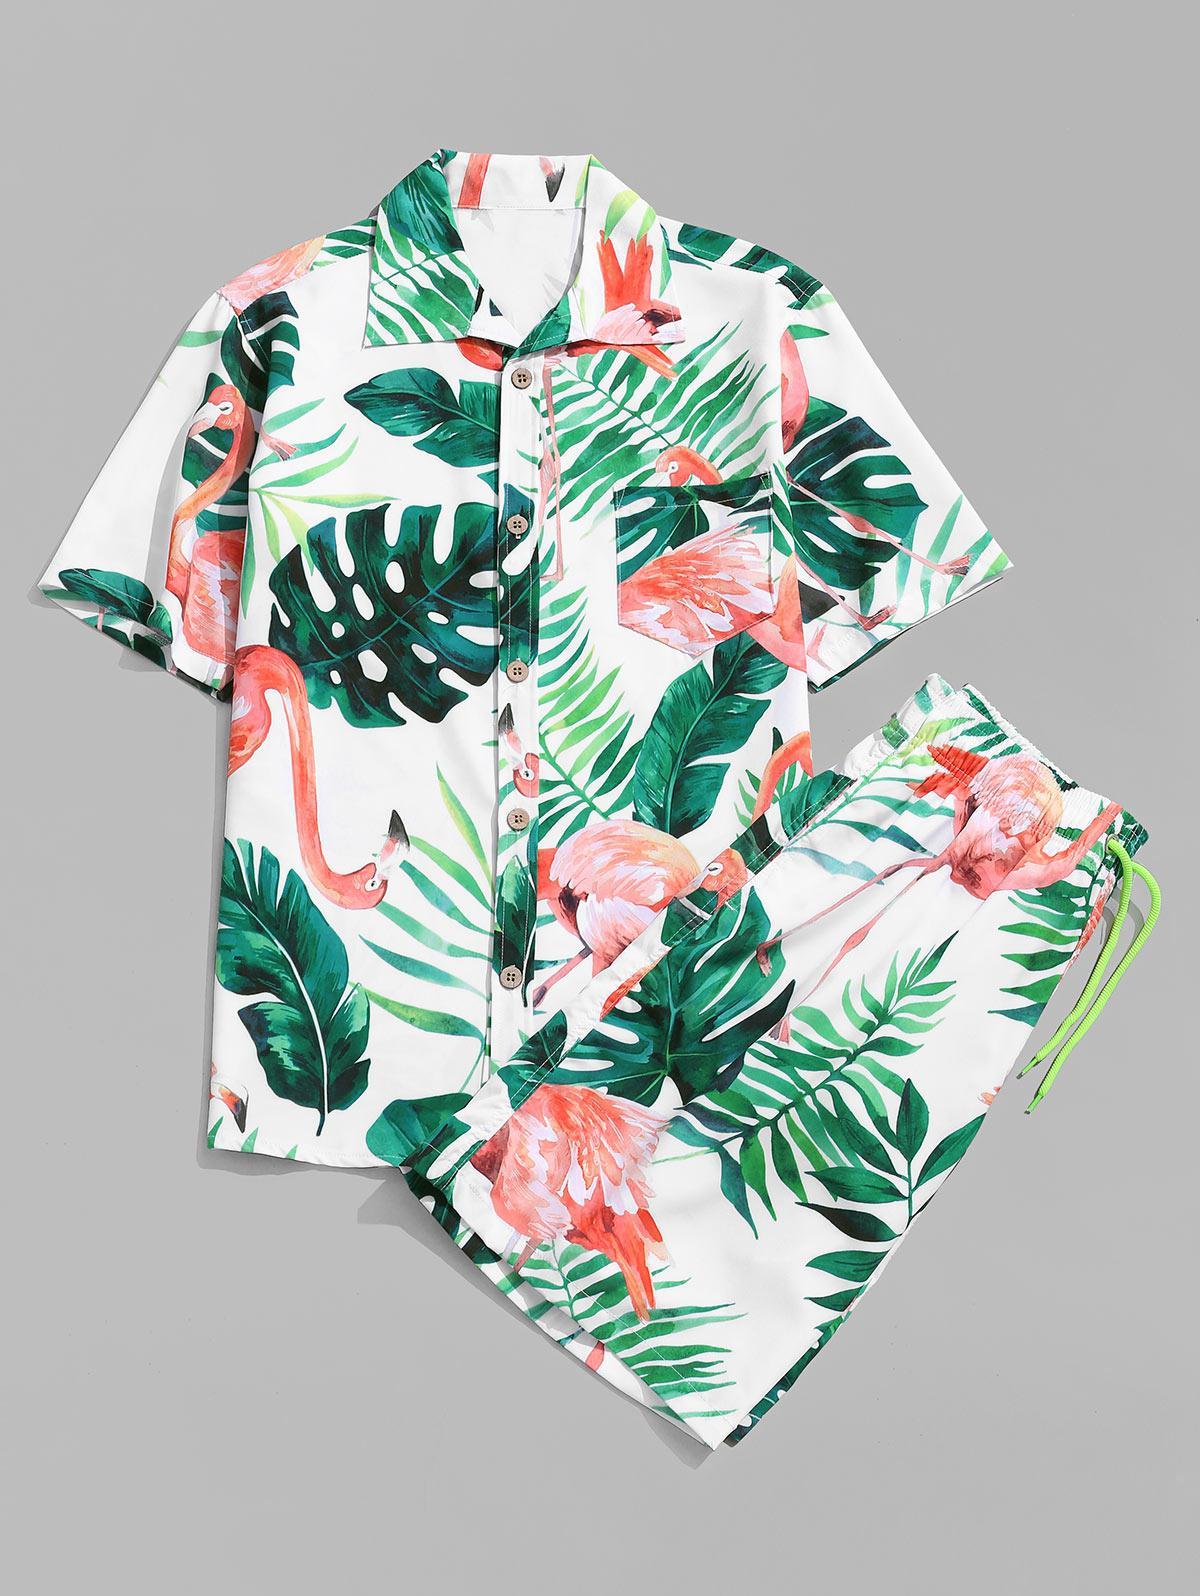 Zaful coupon: Flamingo Leaf Print Shirt and Shorts